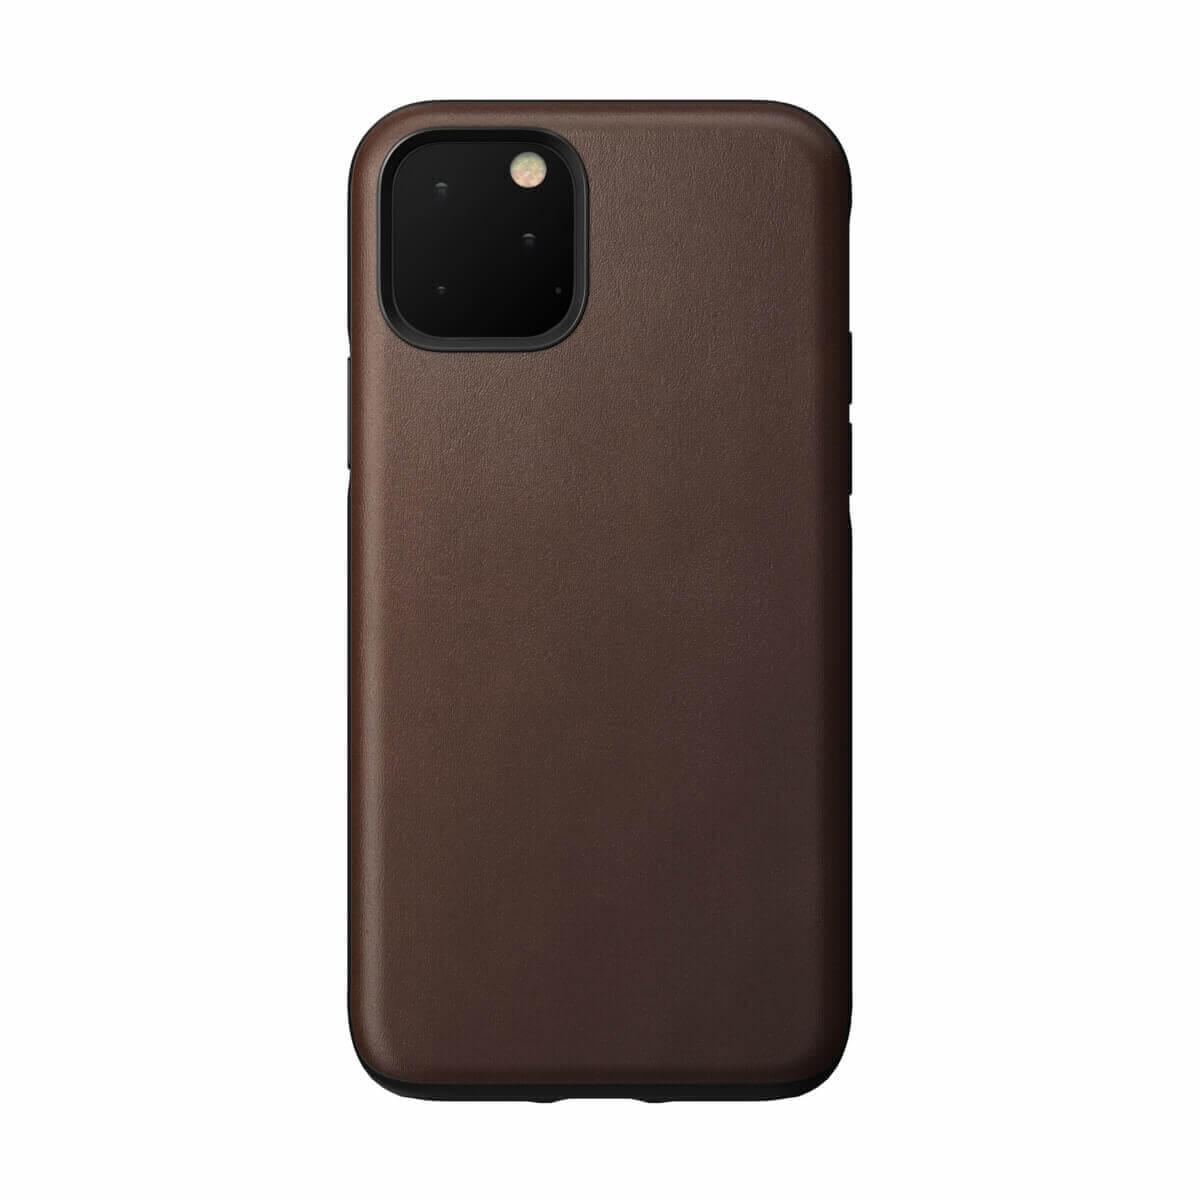 Nomad Leather Rugged Case — кожен (естествена кожа) кейс за iPhone 11 Pro (кафяв) - 1